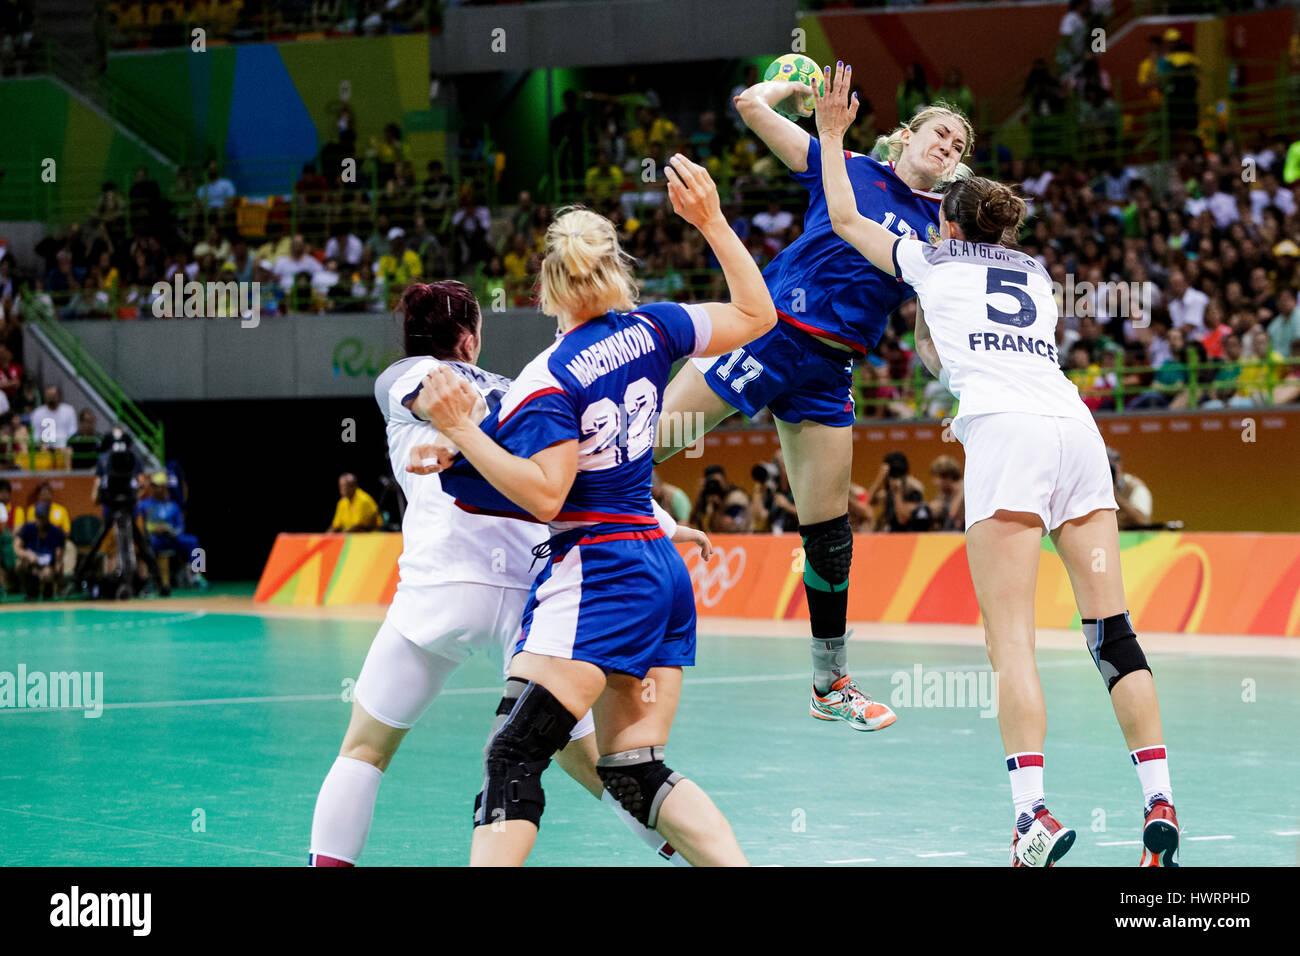 Rio de Janeiro, Brazil. 20 August 2016  Vladlena Bobrovnikova (RUS) #17 defended by Camille Ayglon-Saurina (FRA) - Stock Image